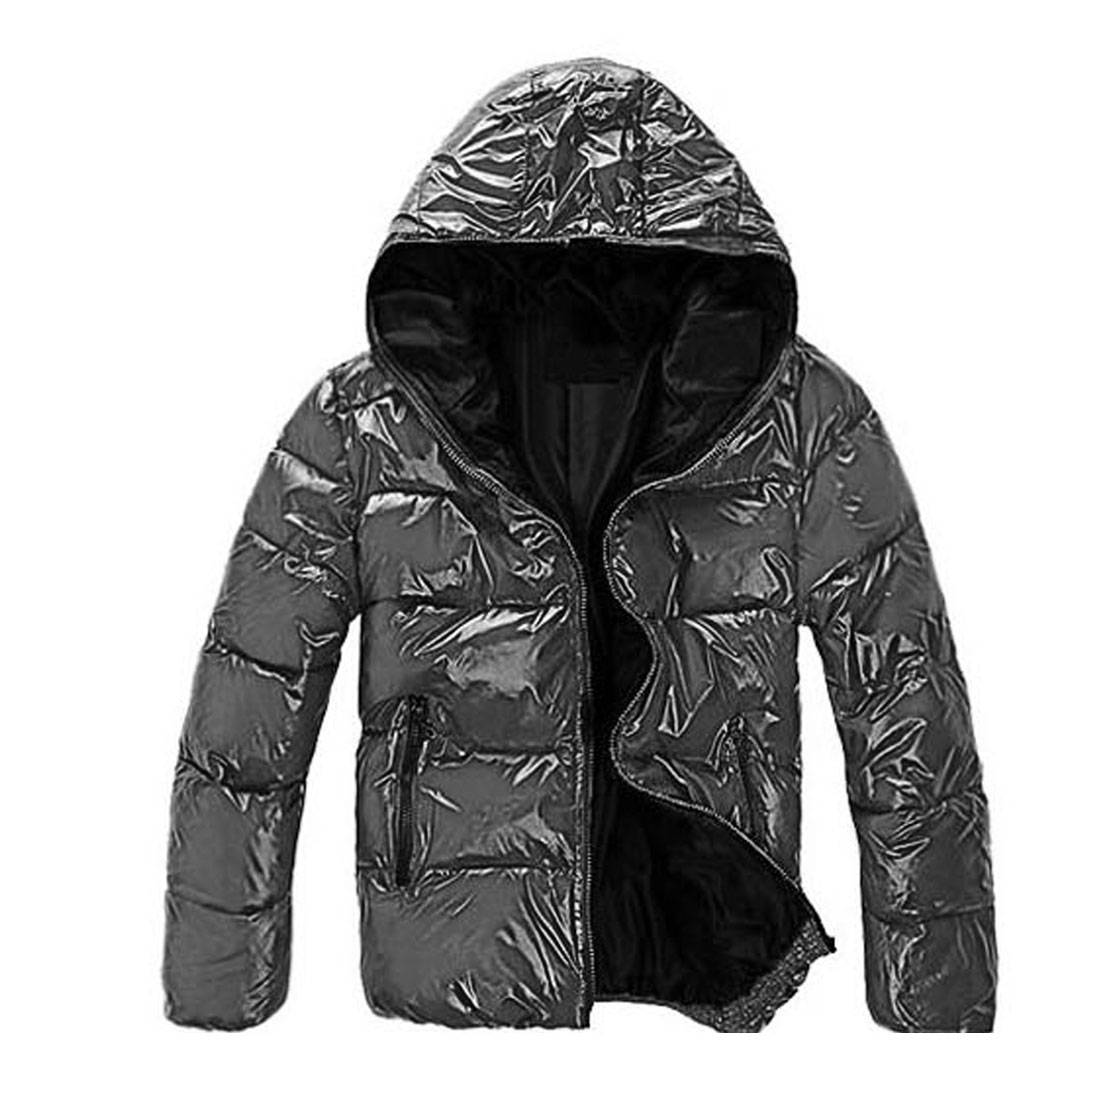 Men Medium Gray Black Long Sleeve Zip Up Hoody Winter Wadded Jacket M